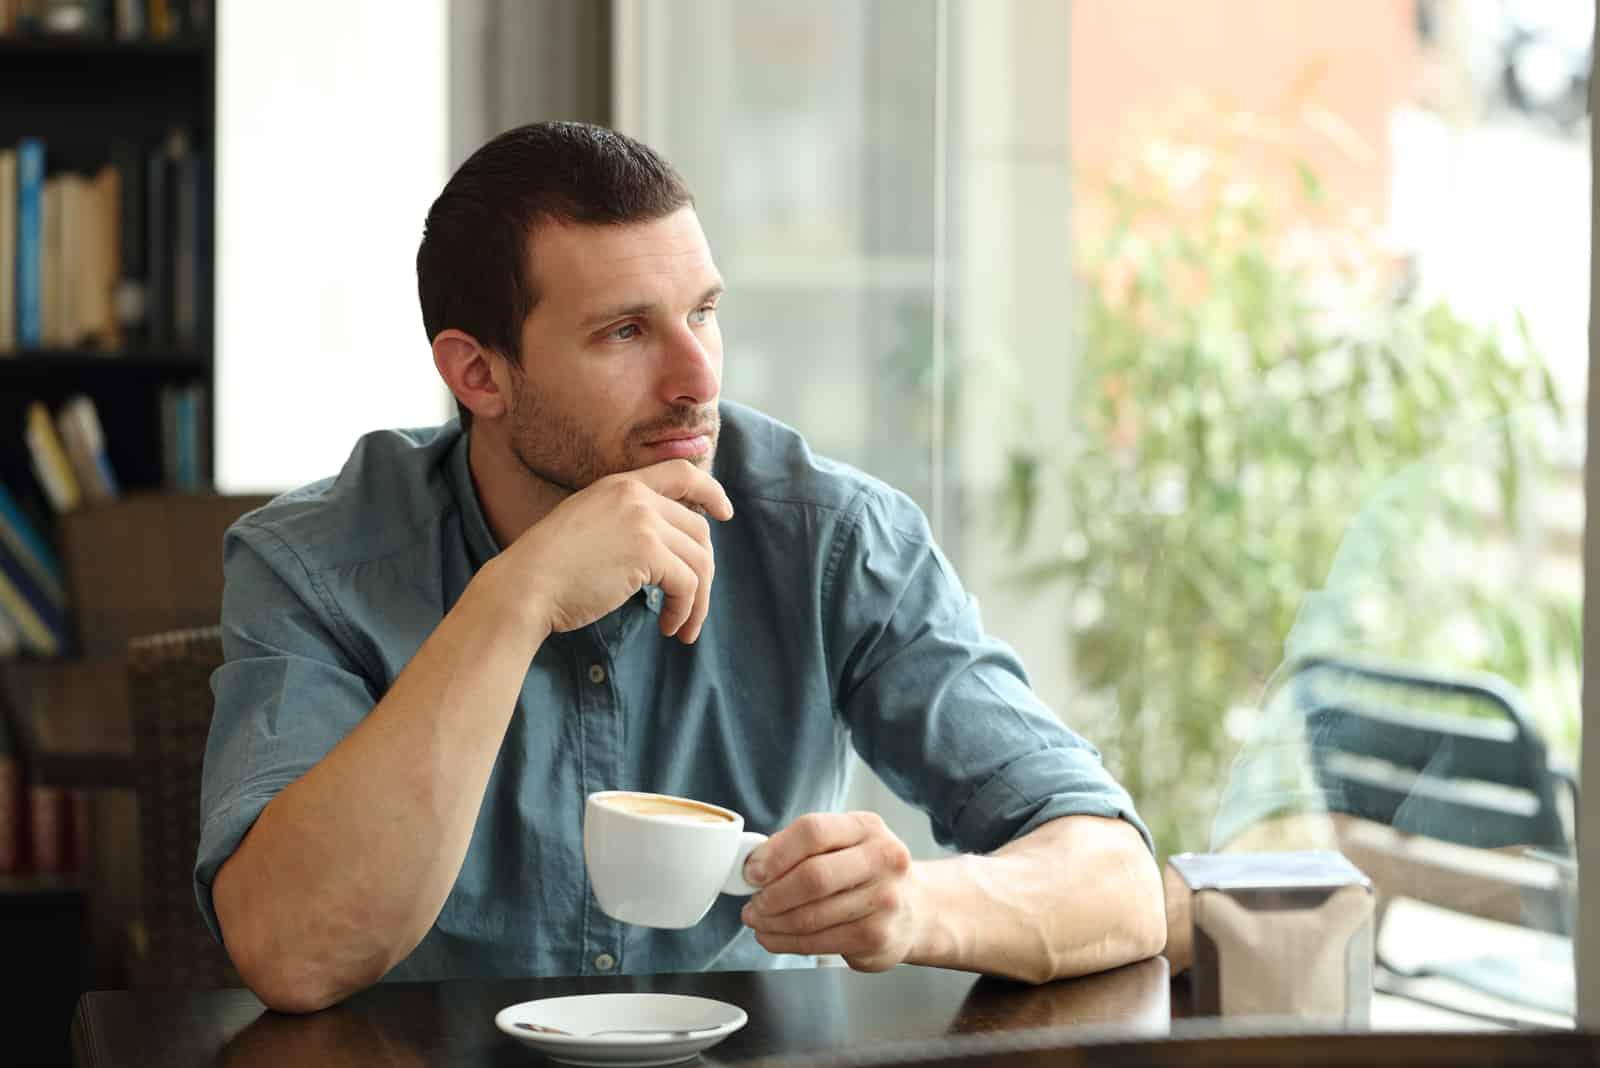 a sad man sitting in a cafe drinking coffee